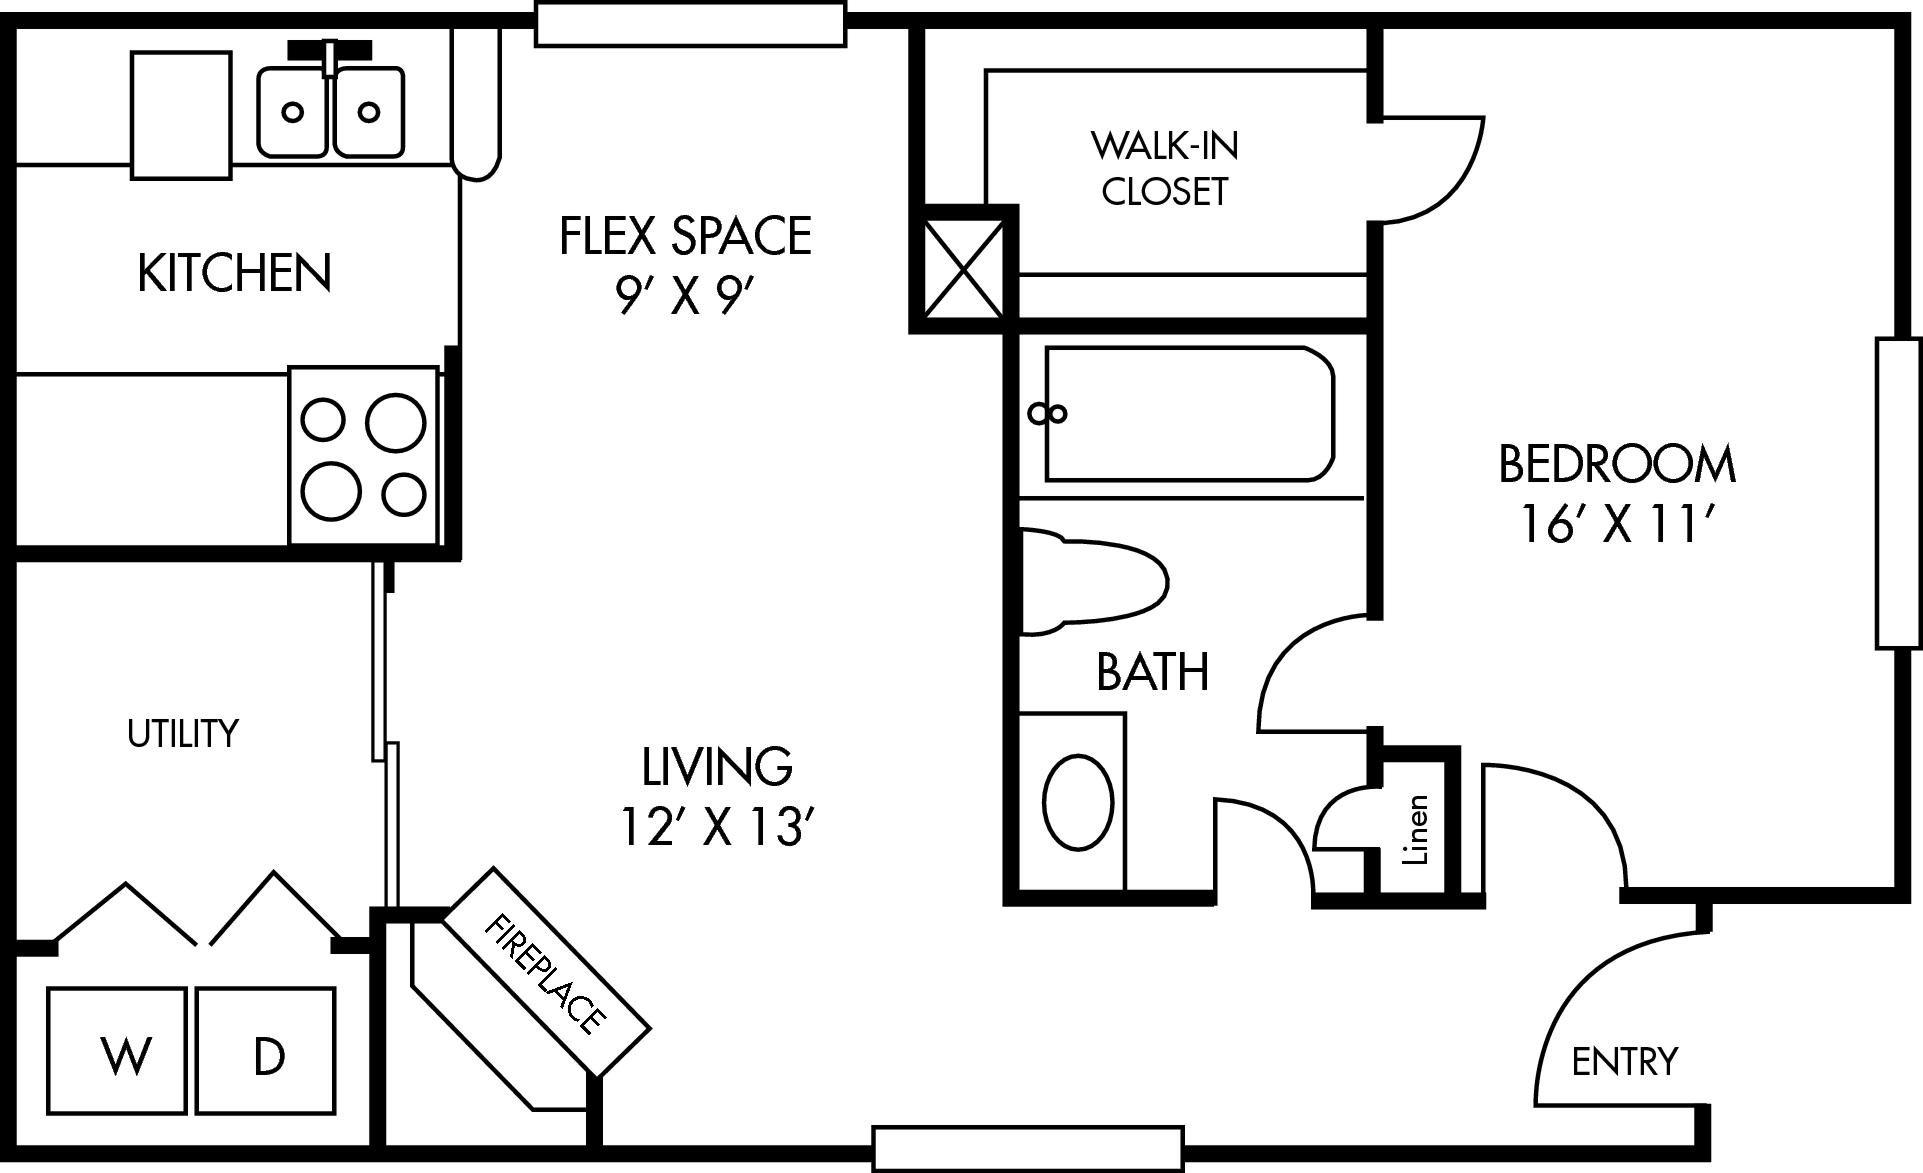 Breckenridge at Cityview 1 bed 1 bath Floor Plan 1072 - Houston Texas Apartment Complex